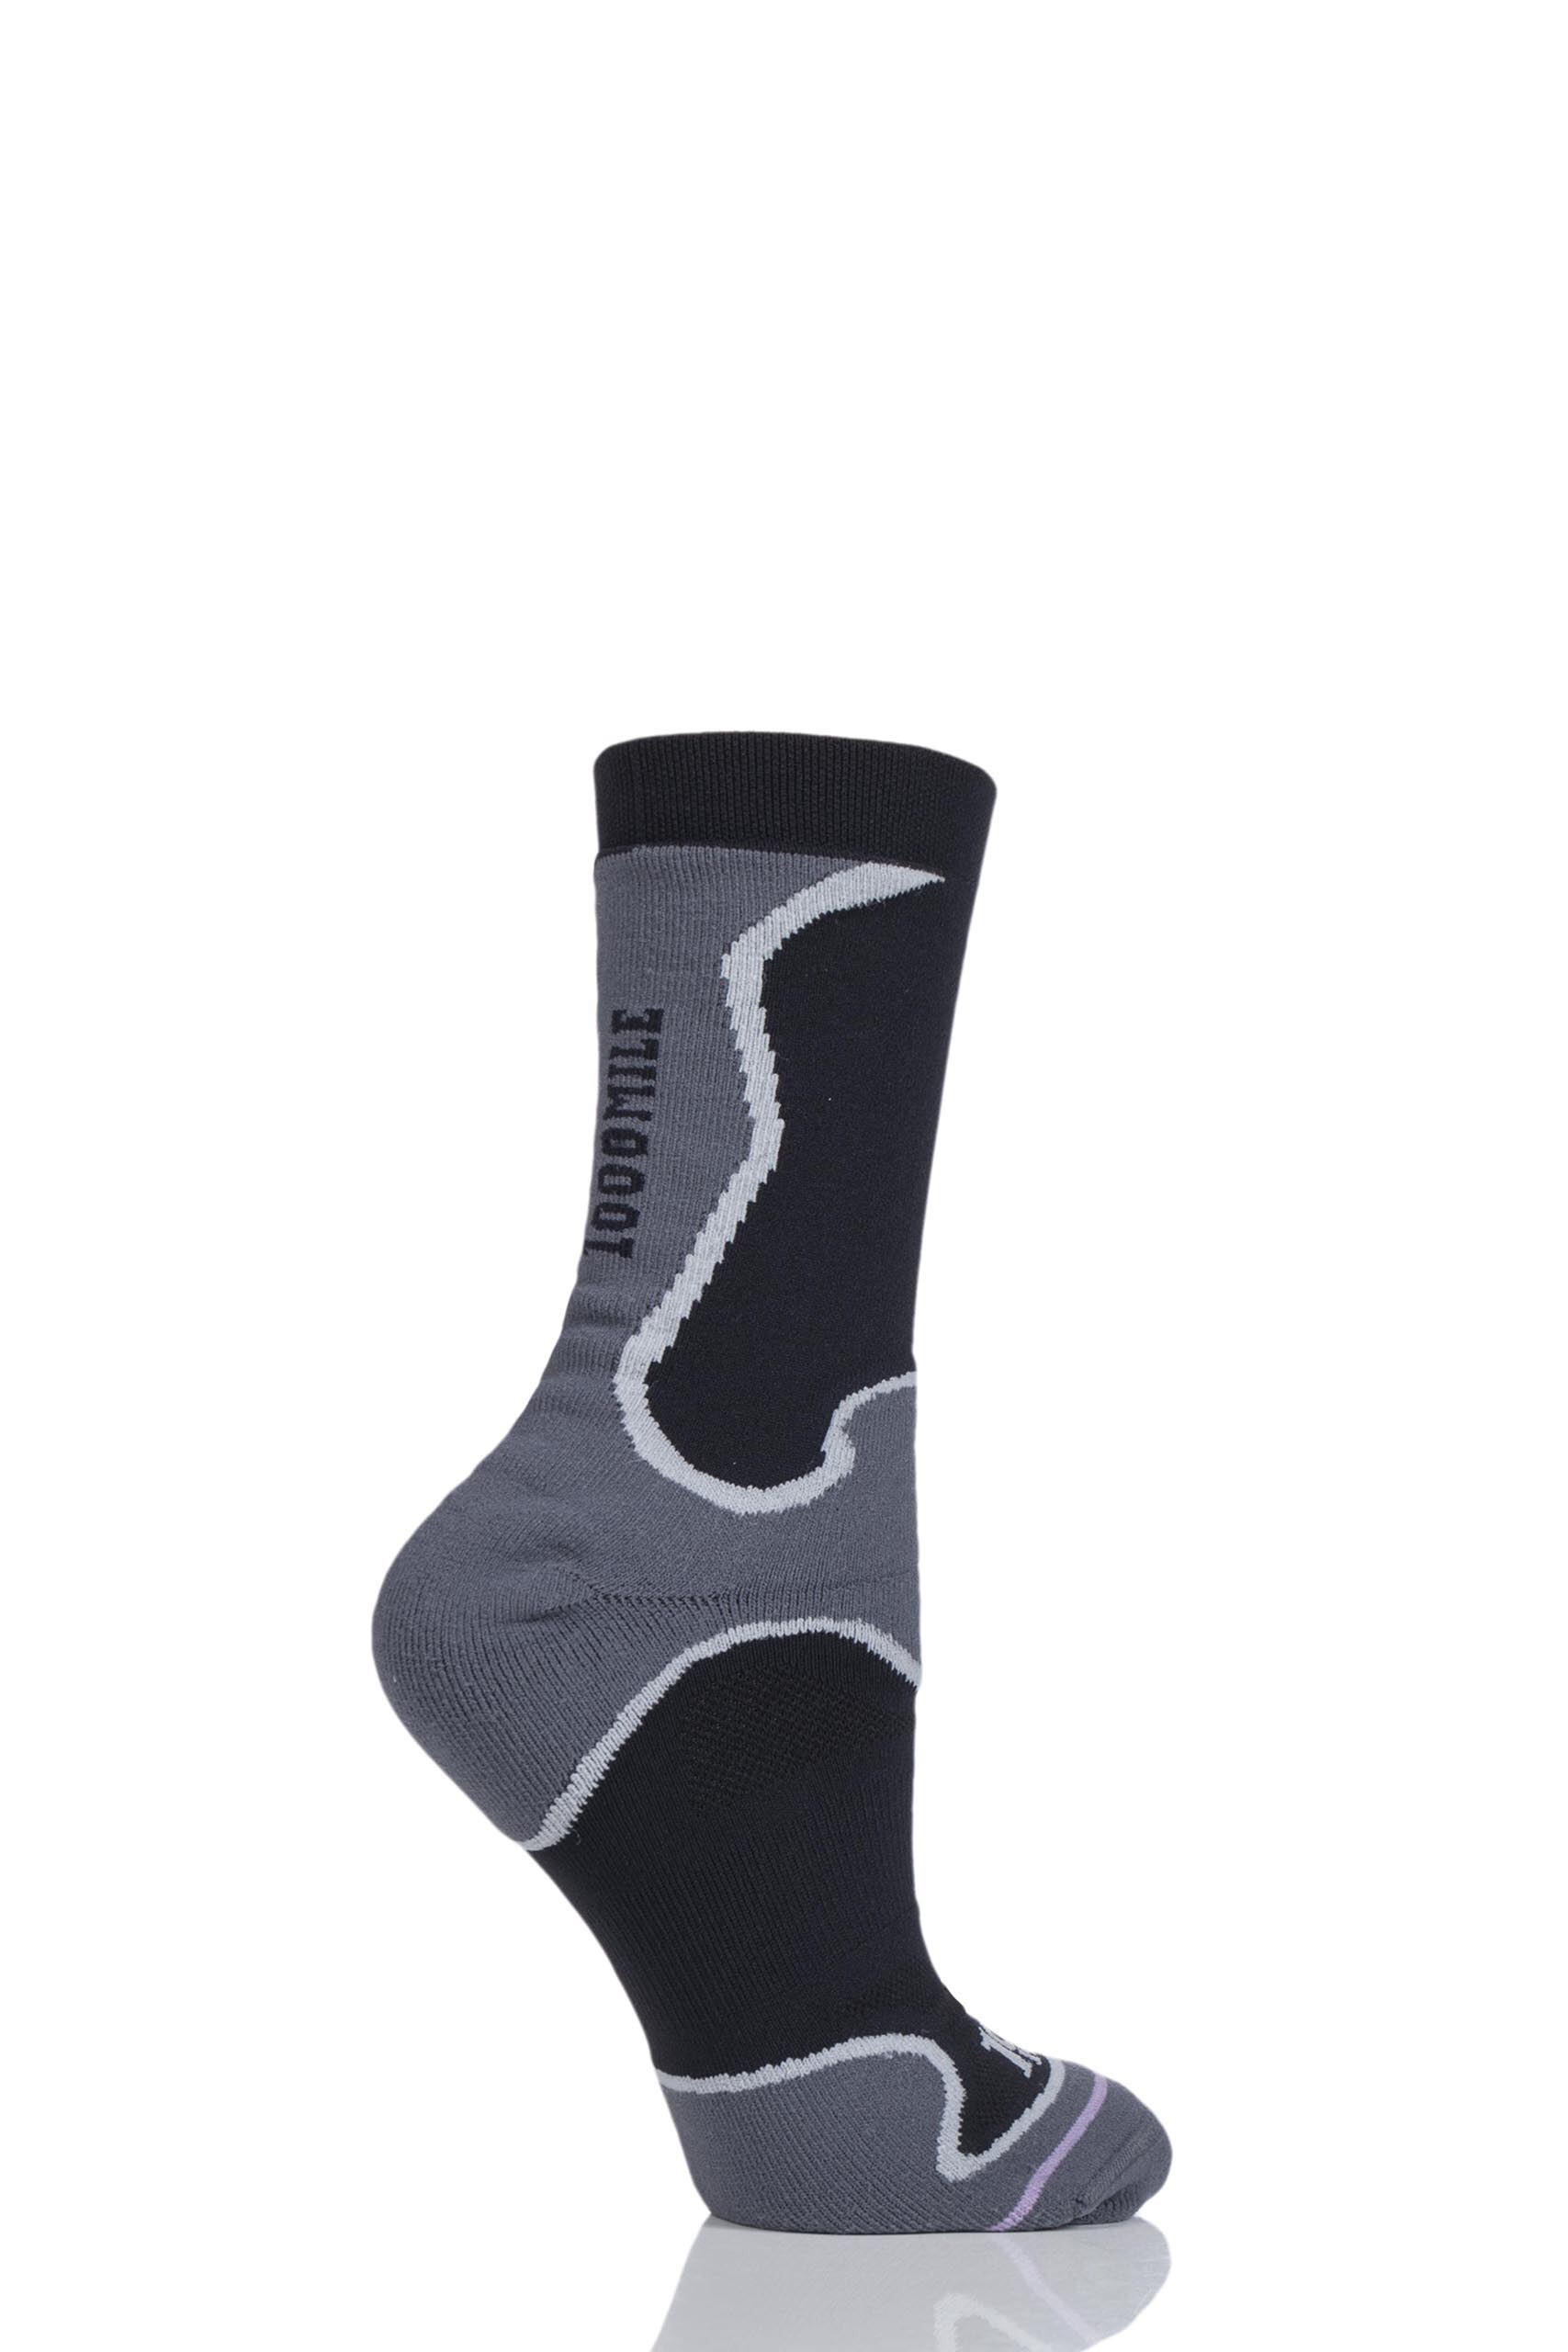 Image of 1 Pair Black Athletic Fusion Socks Unisex 6-8.5 Mens - 1000 Mile